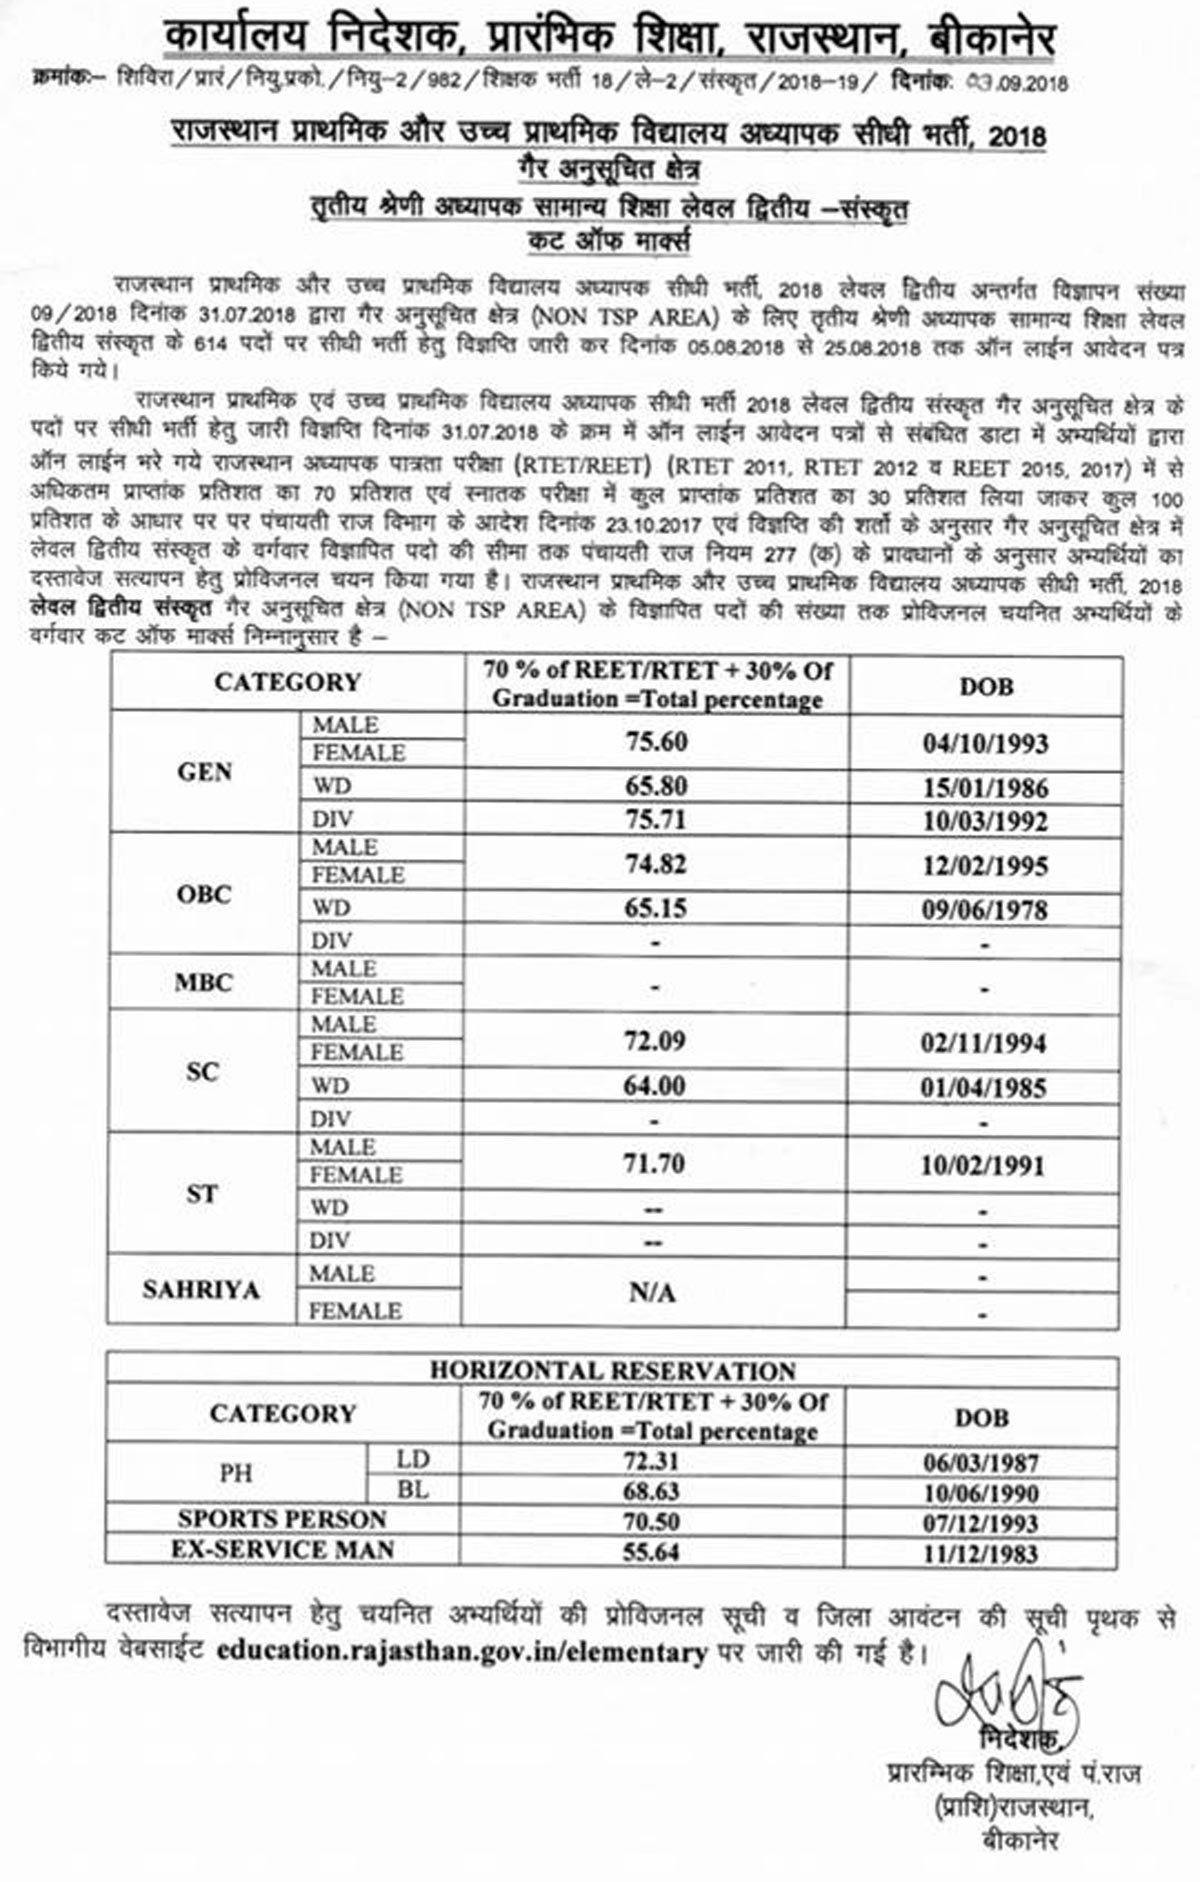 Rajasthan Teacher Recruitment 2018: Provisional Lists for